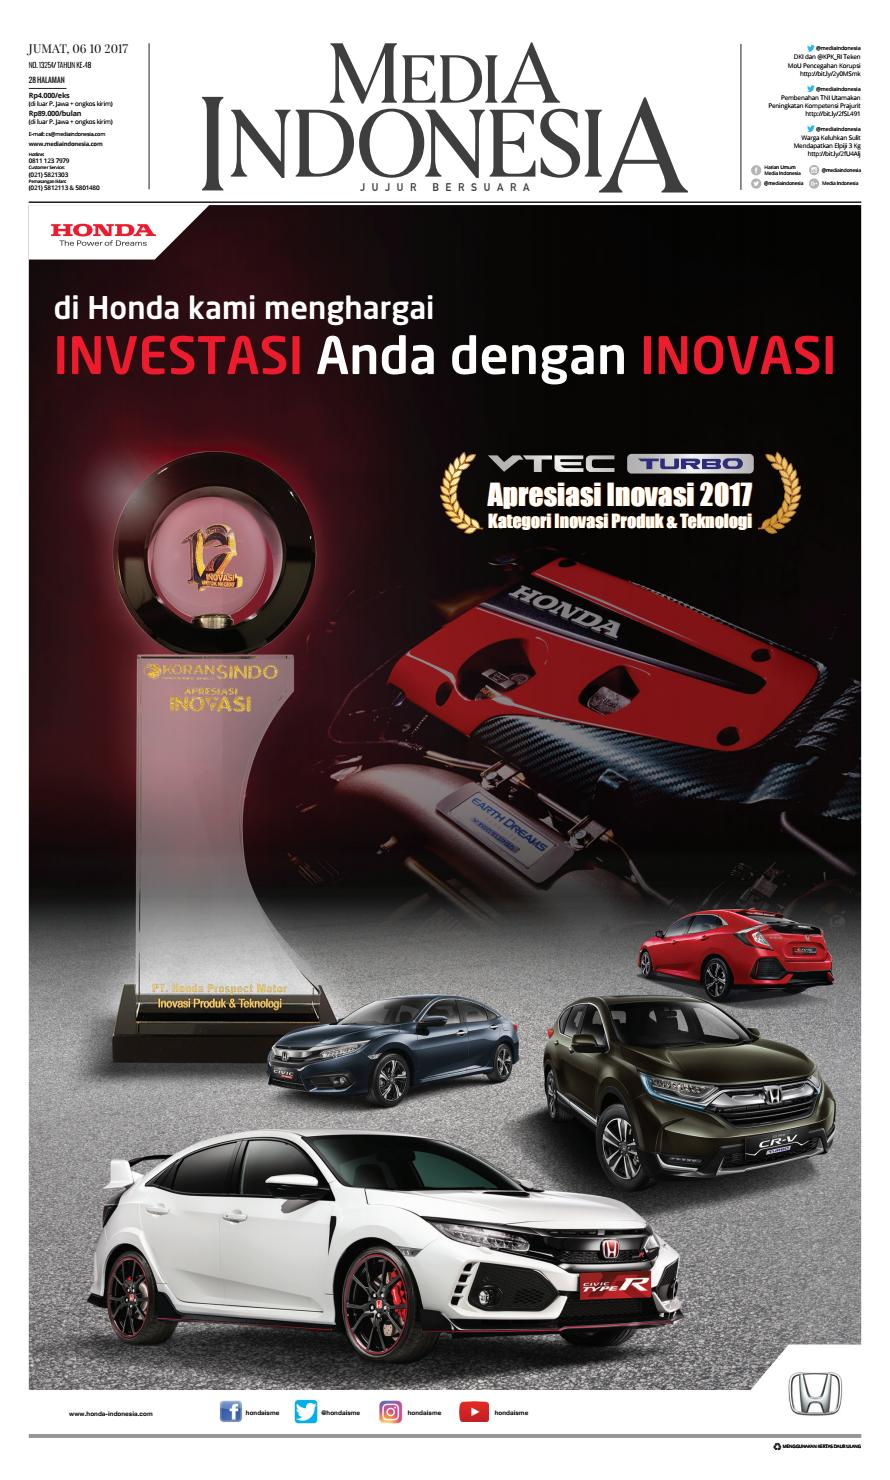 Media Indonesia 18 12 2017 18122017050406 By Oppah Issuu Produk Ukm Bumn Baterai Abc Alkaline Aa Mediaindonesia 06 10 06102017015828